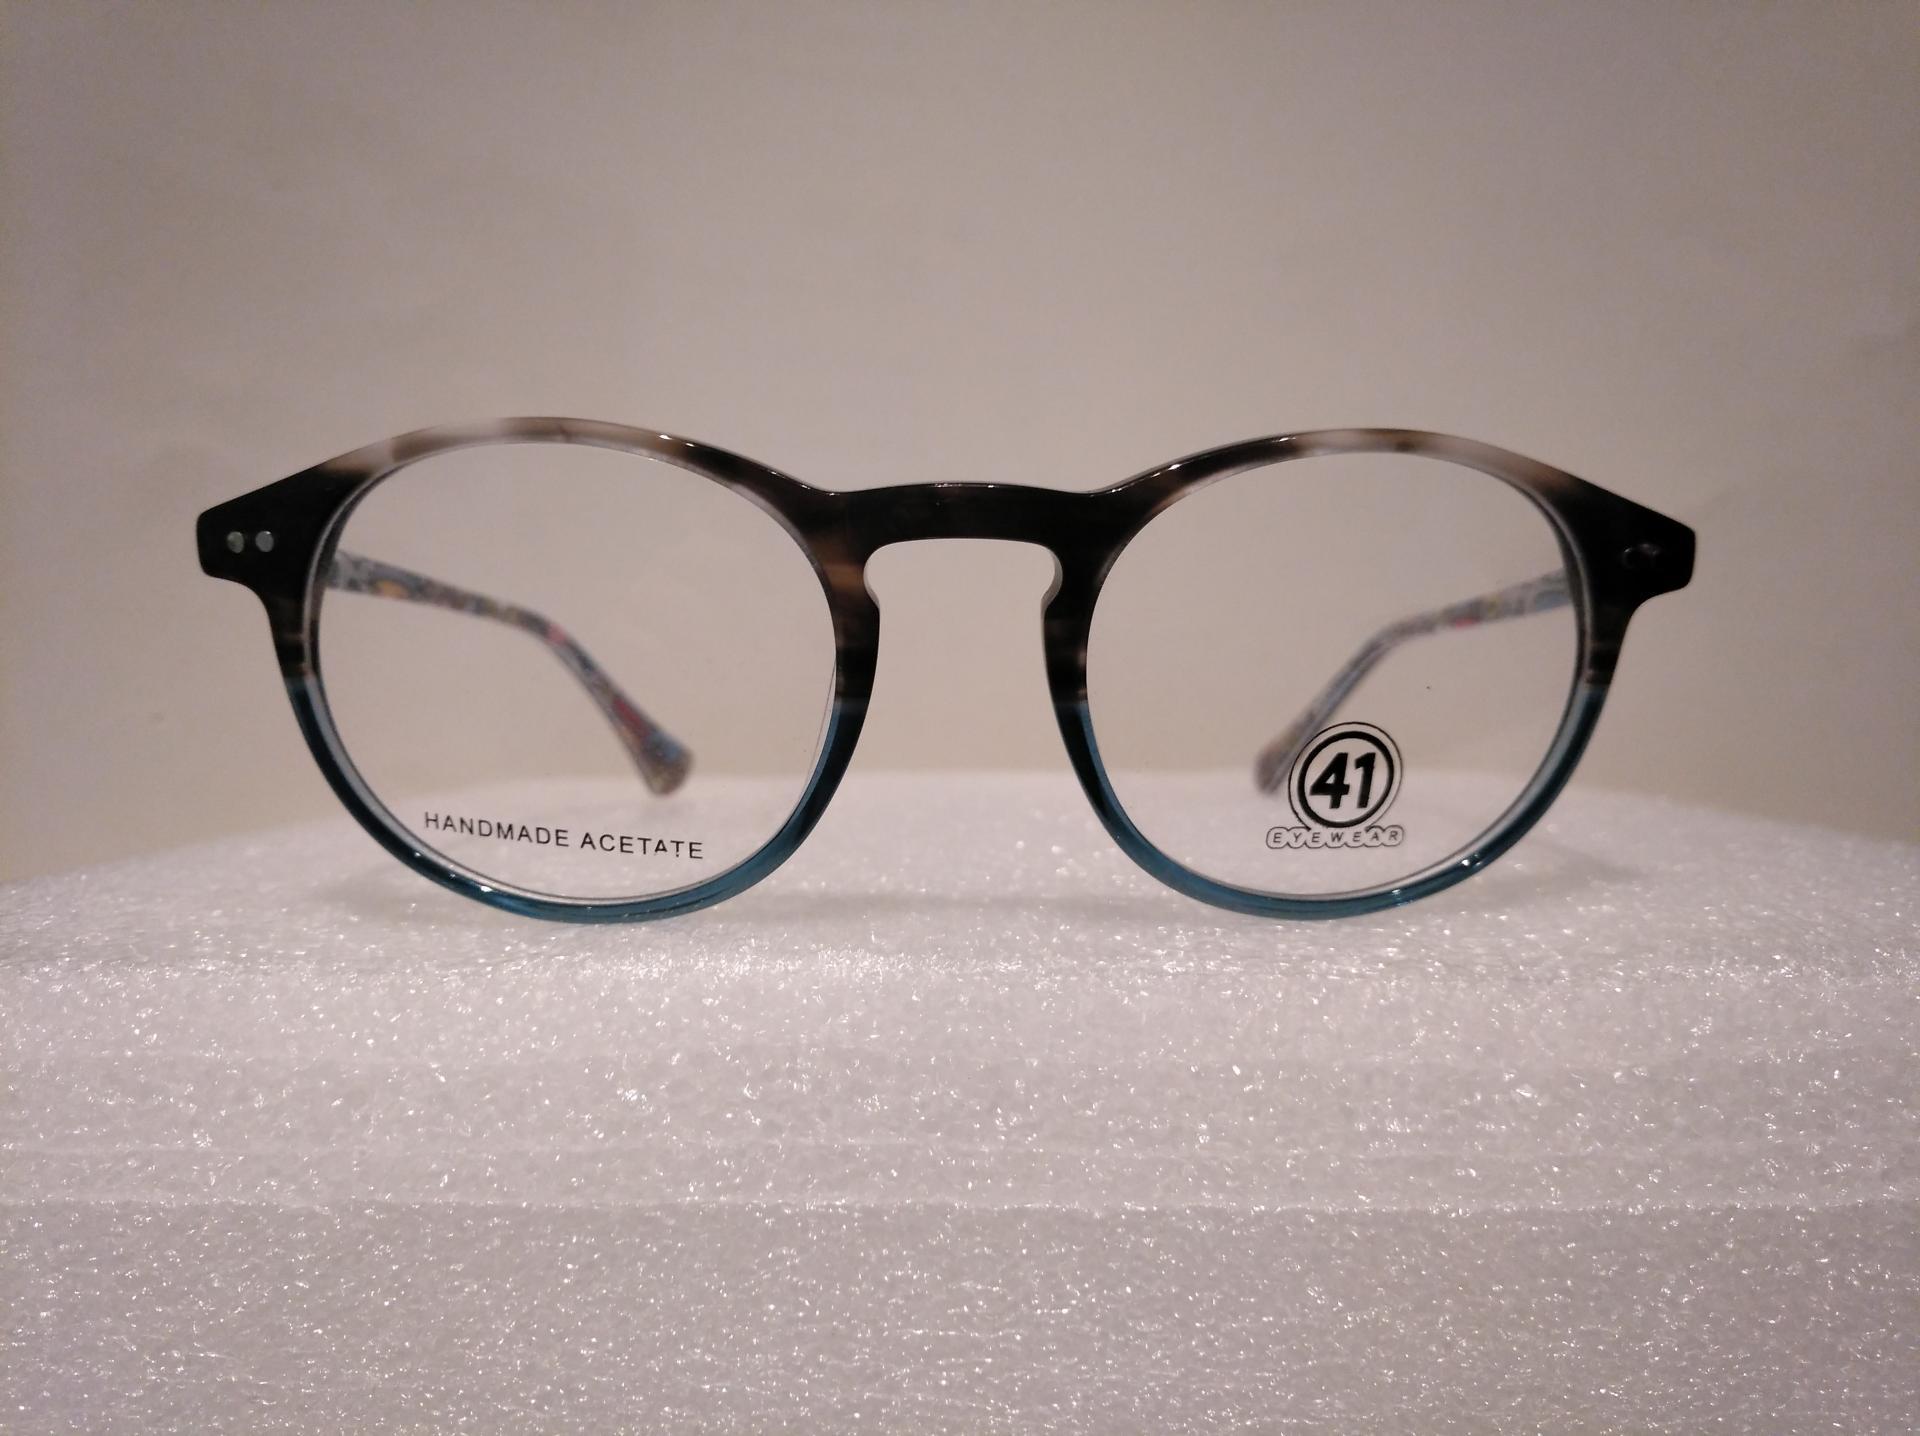 41 Eyewear FO10029